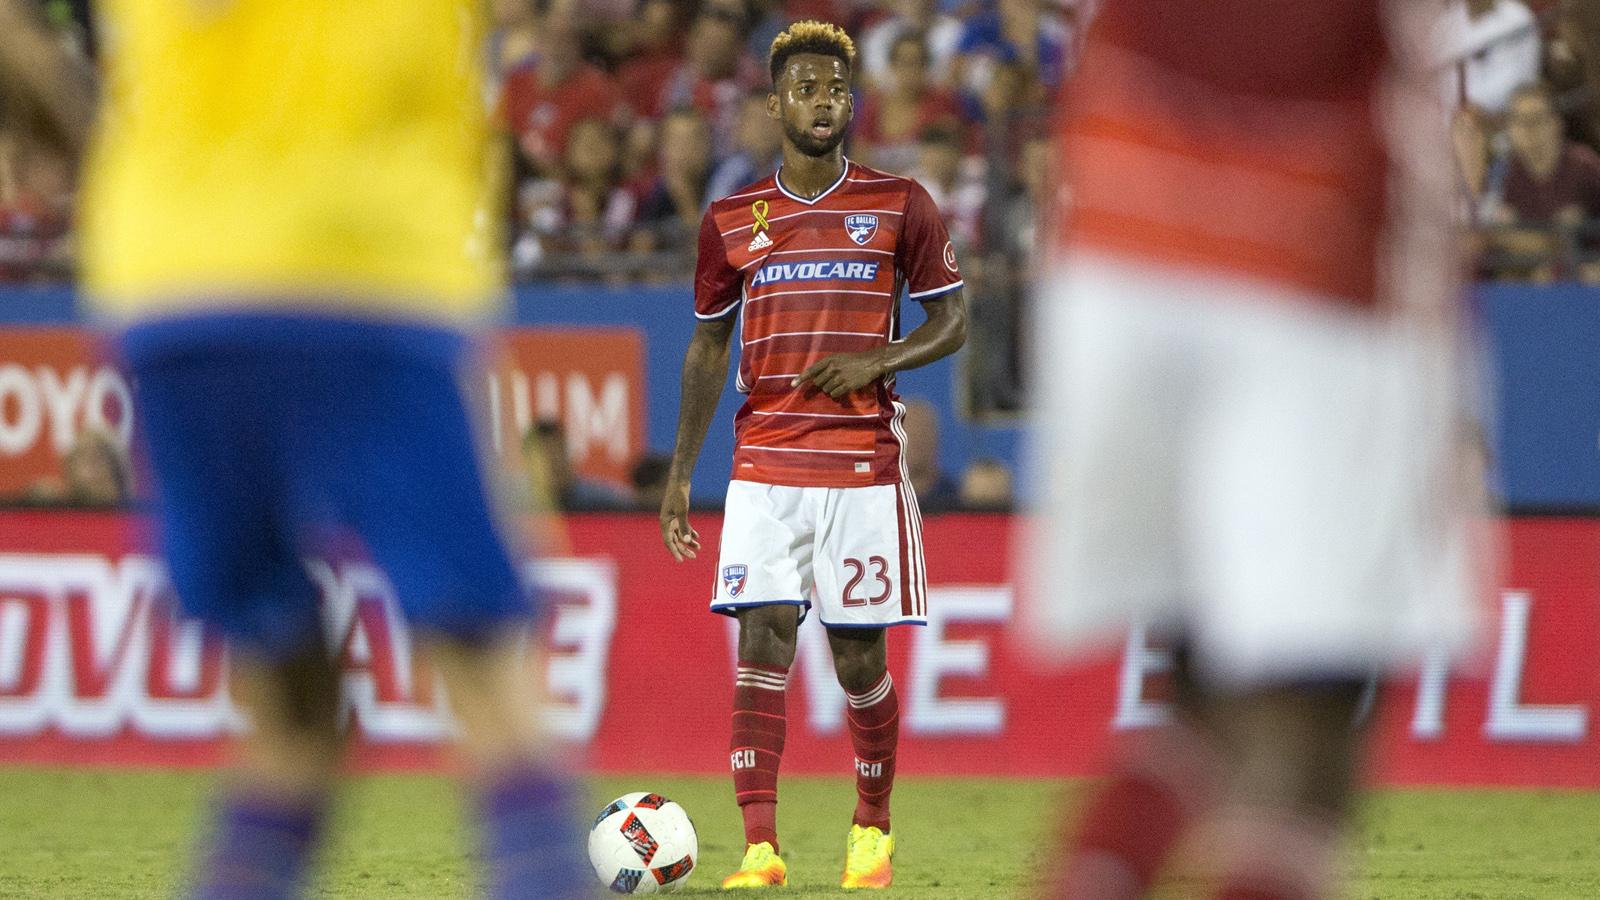 FC Dallas are chasing a treble and American soccer history